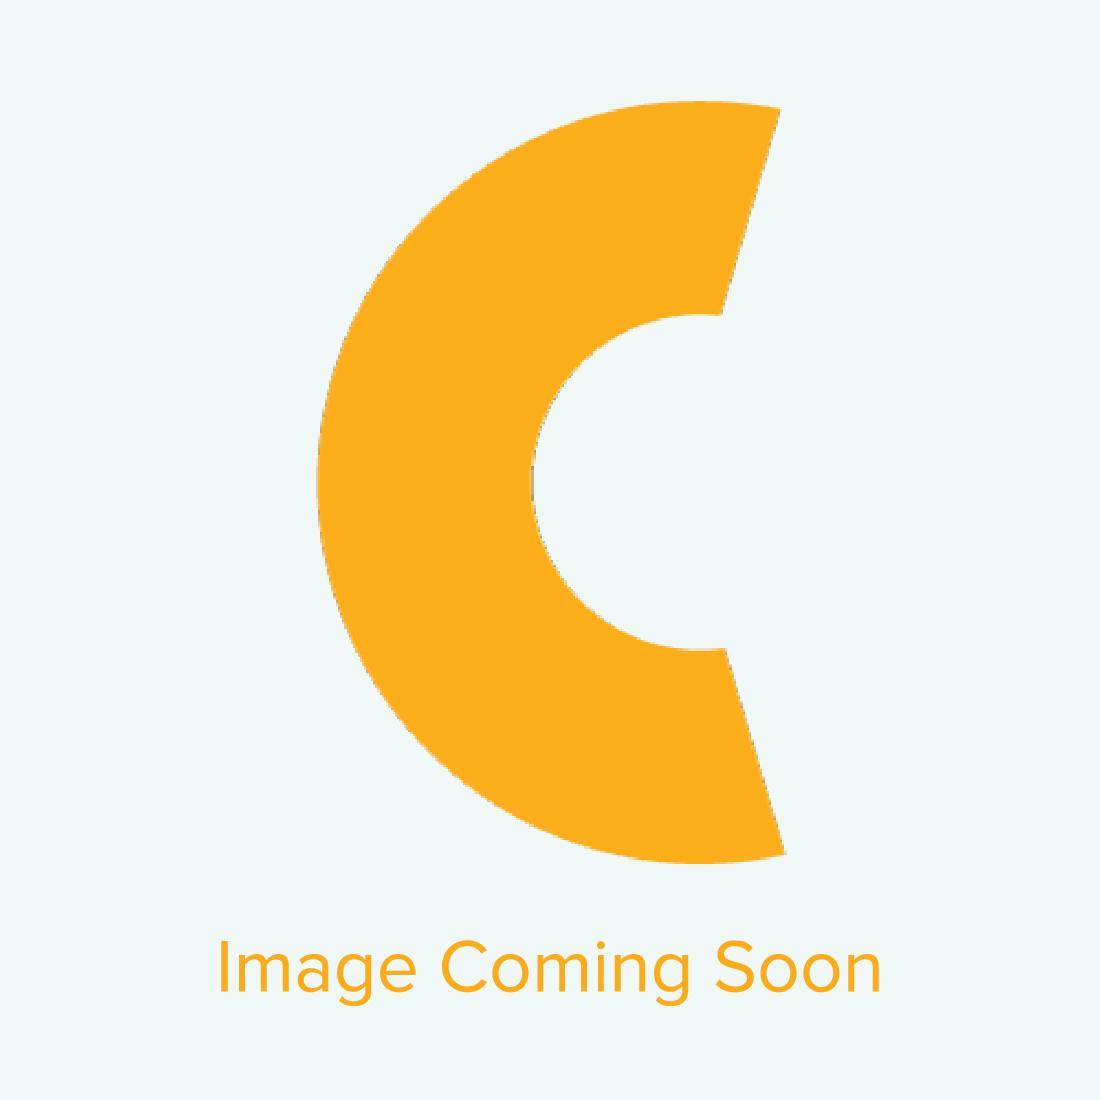 White Sandstone Car Coaster Sublimation Blanks – 6.7cm